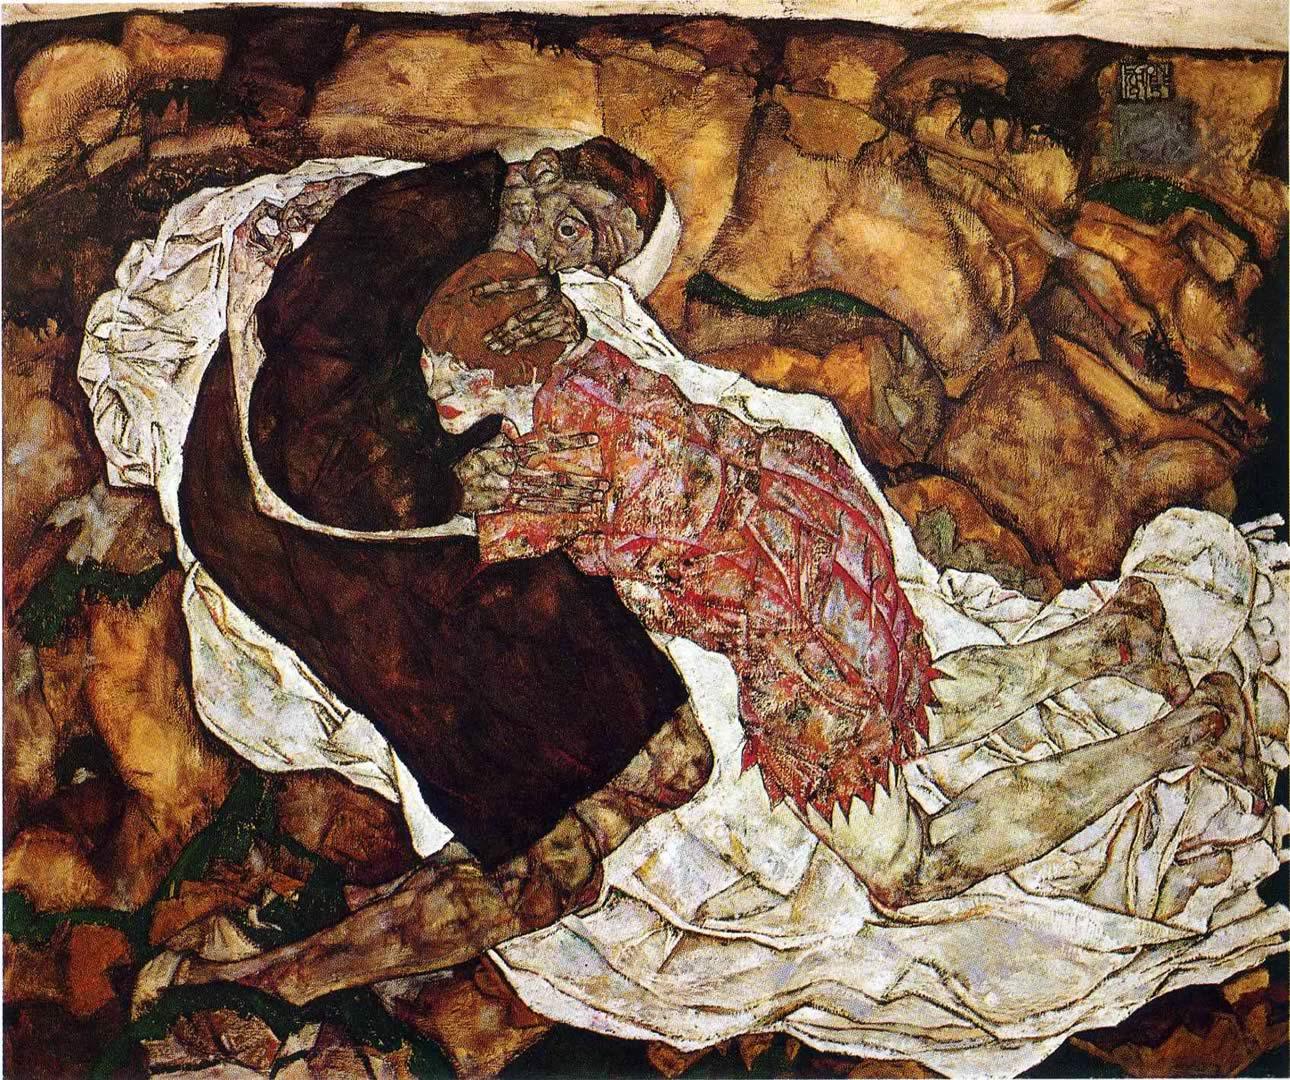 1290x1080 Death And The Maiden - Hình nền Egon Schiele